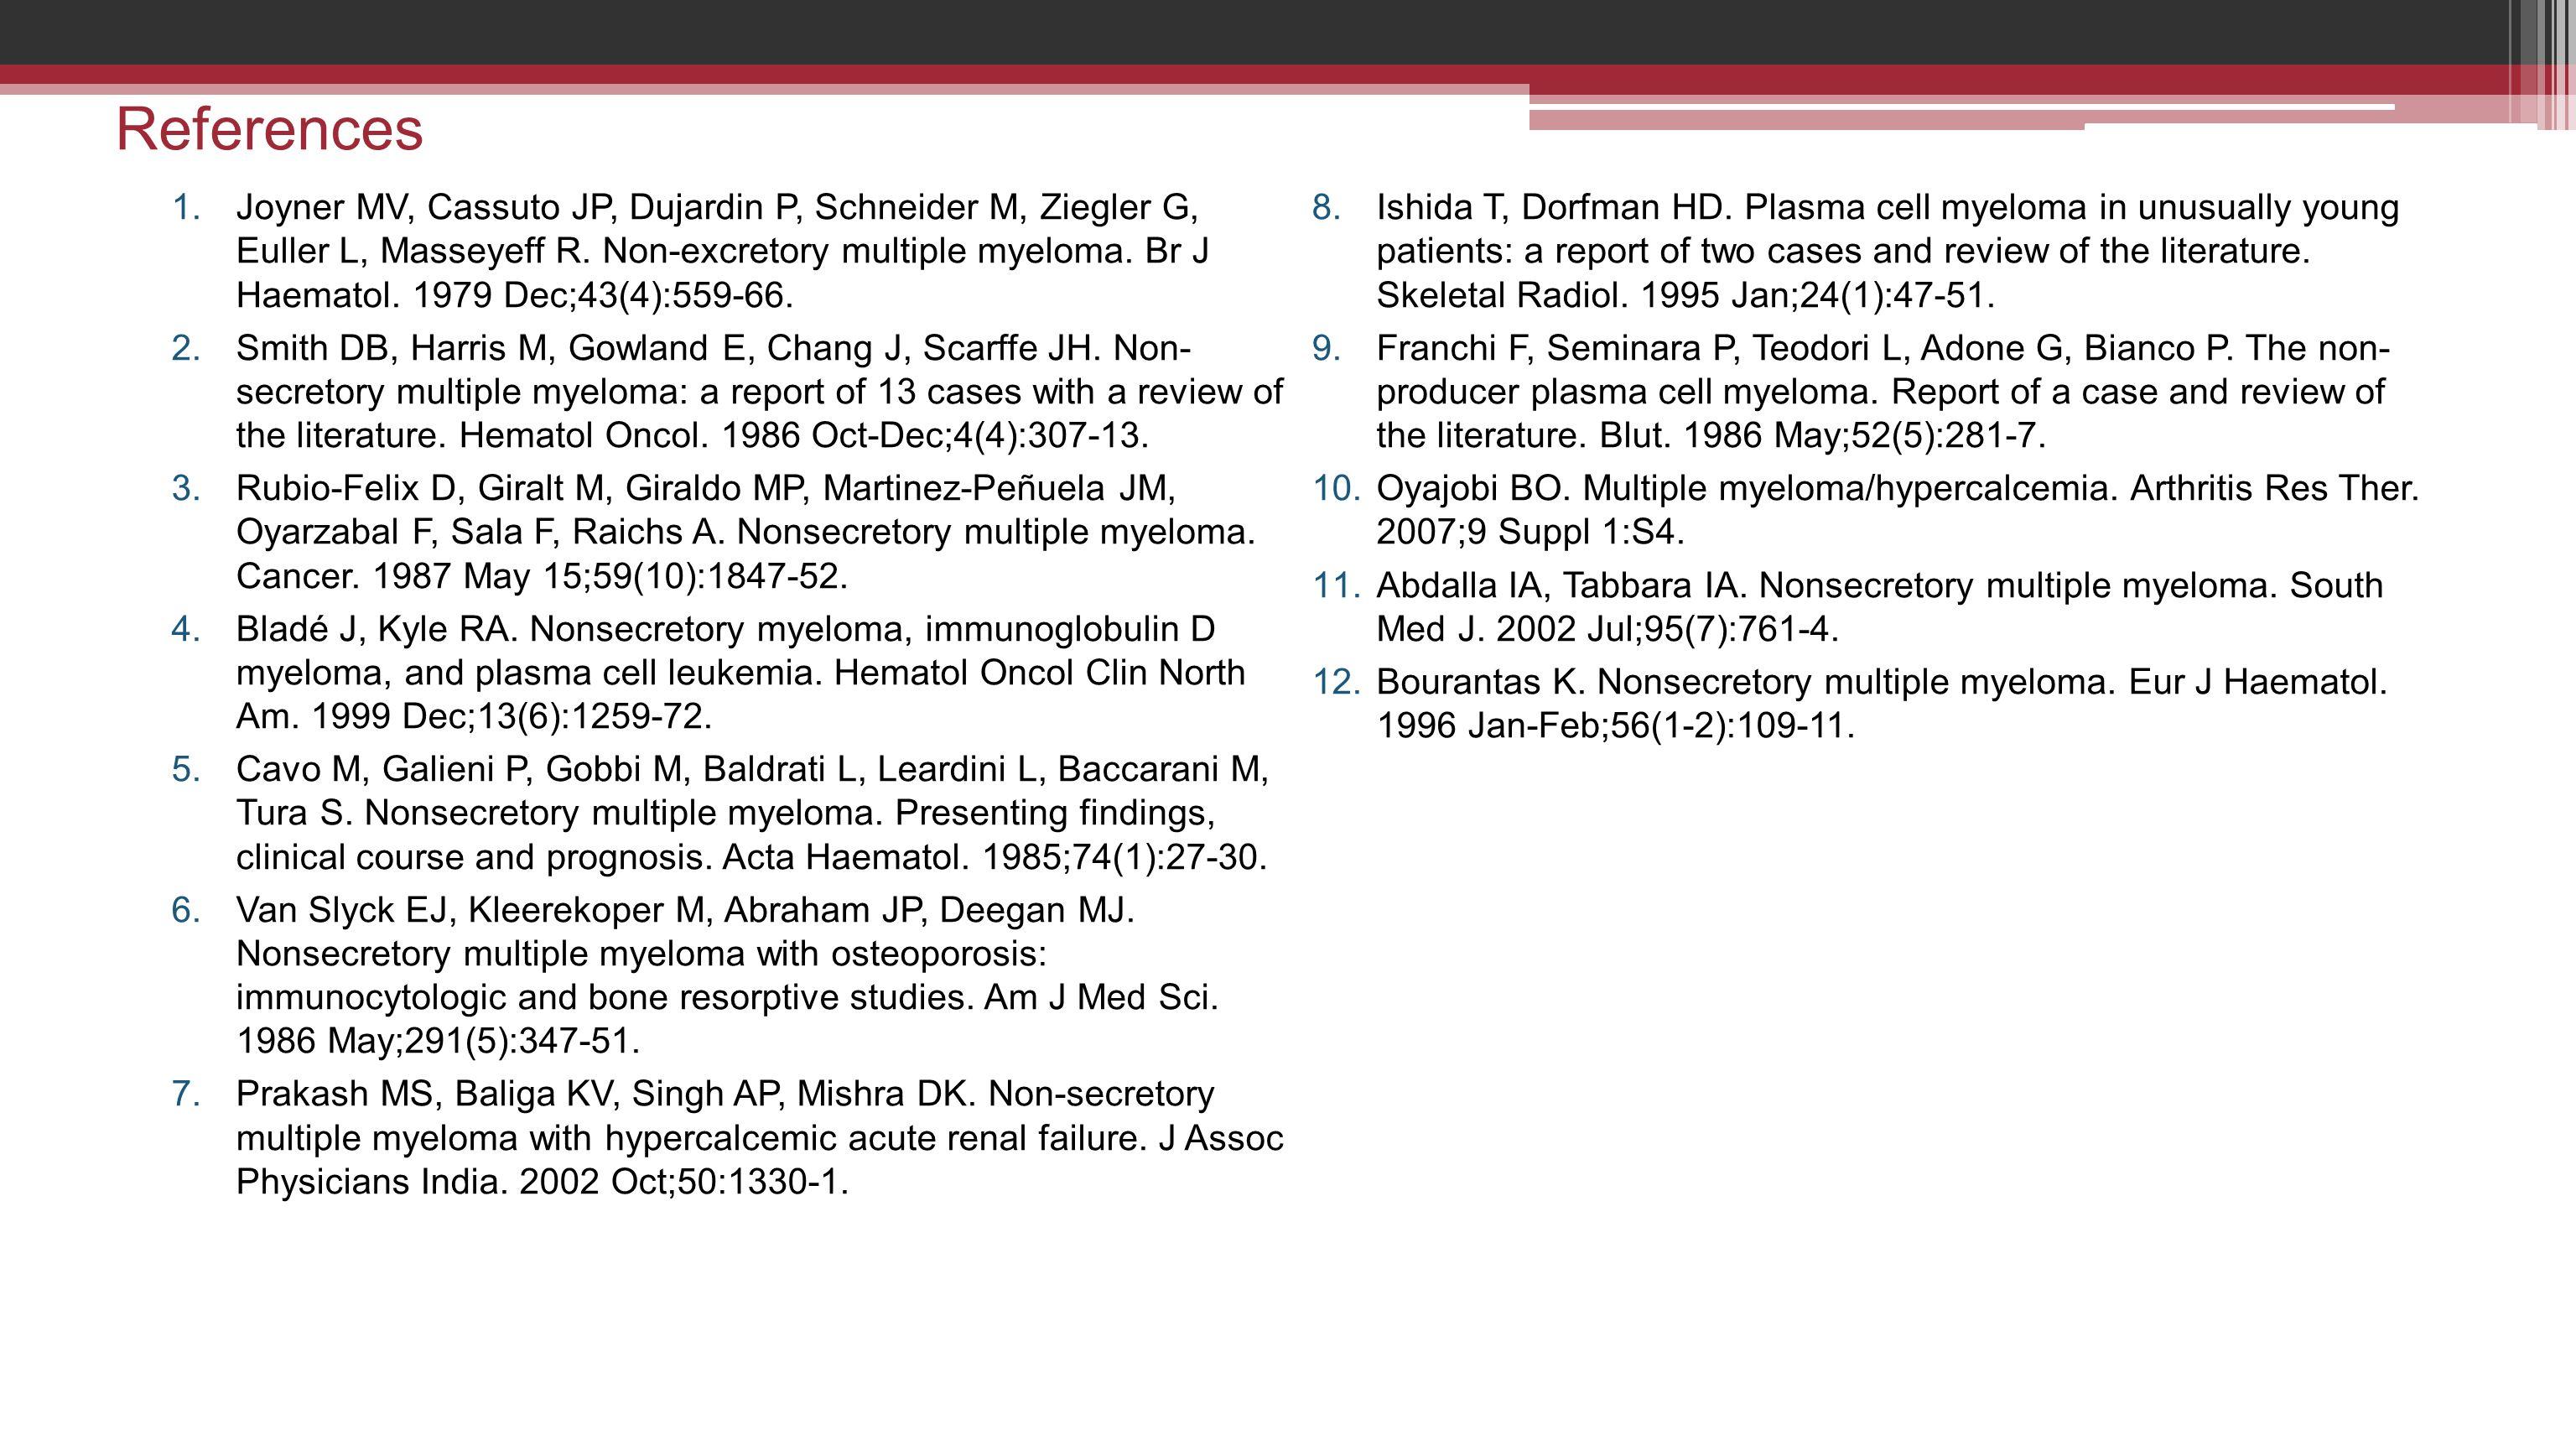 References 1.Joyner MV, Cassuto JP, Dujardin P, Schneider M, Ziegler G, Euller L, Masseyeff R. Non-excretory multiple myeloma. Br J Haematol. 1979 Dec